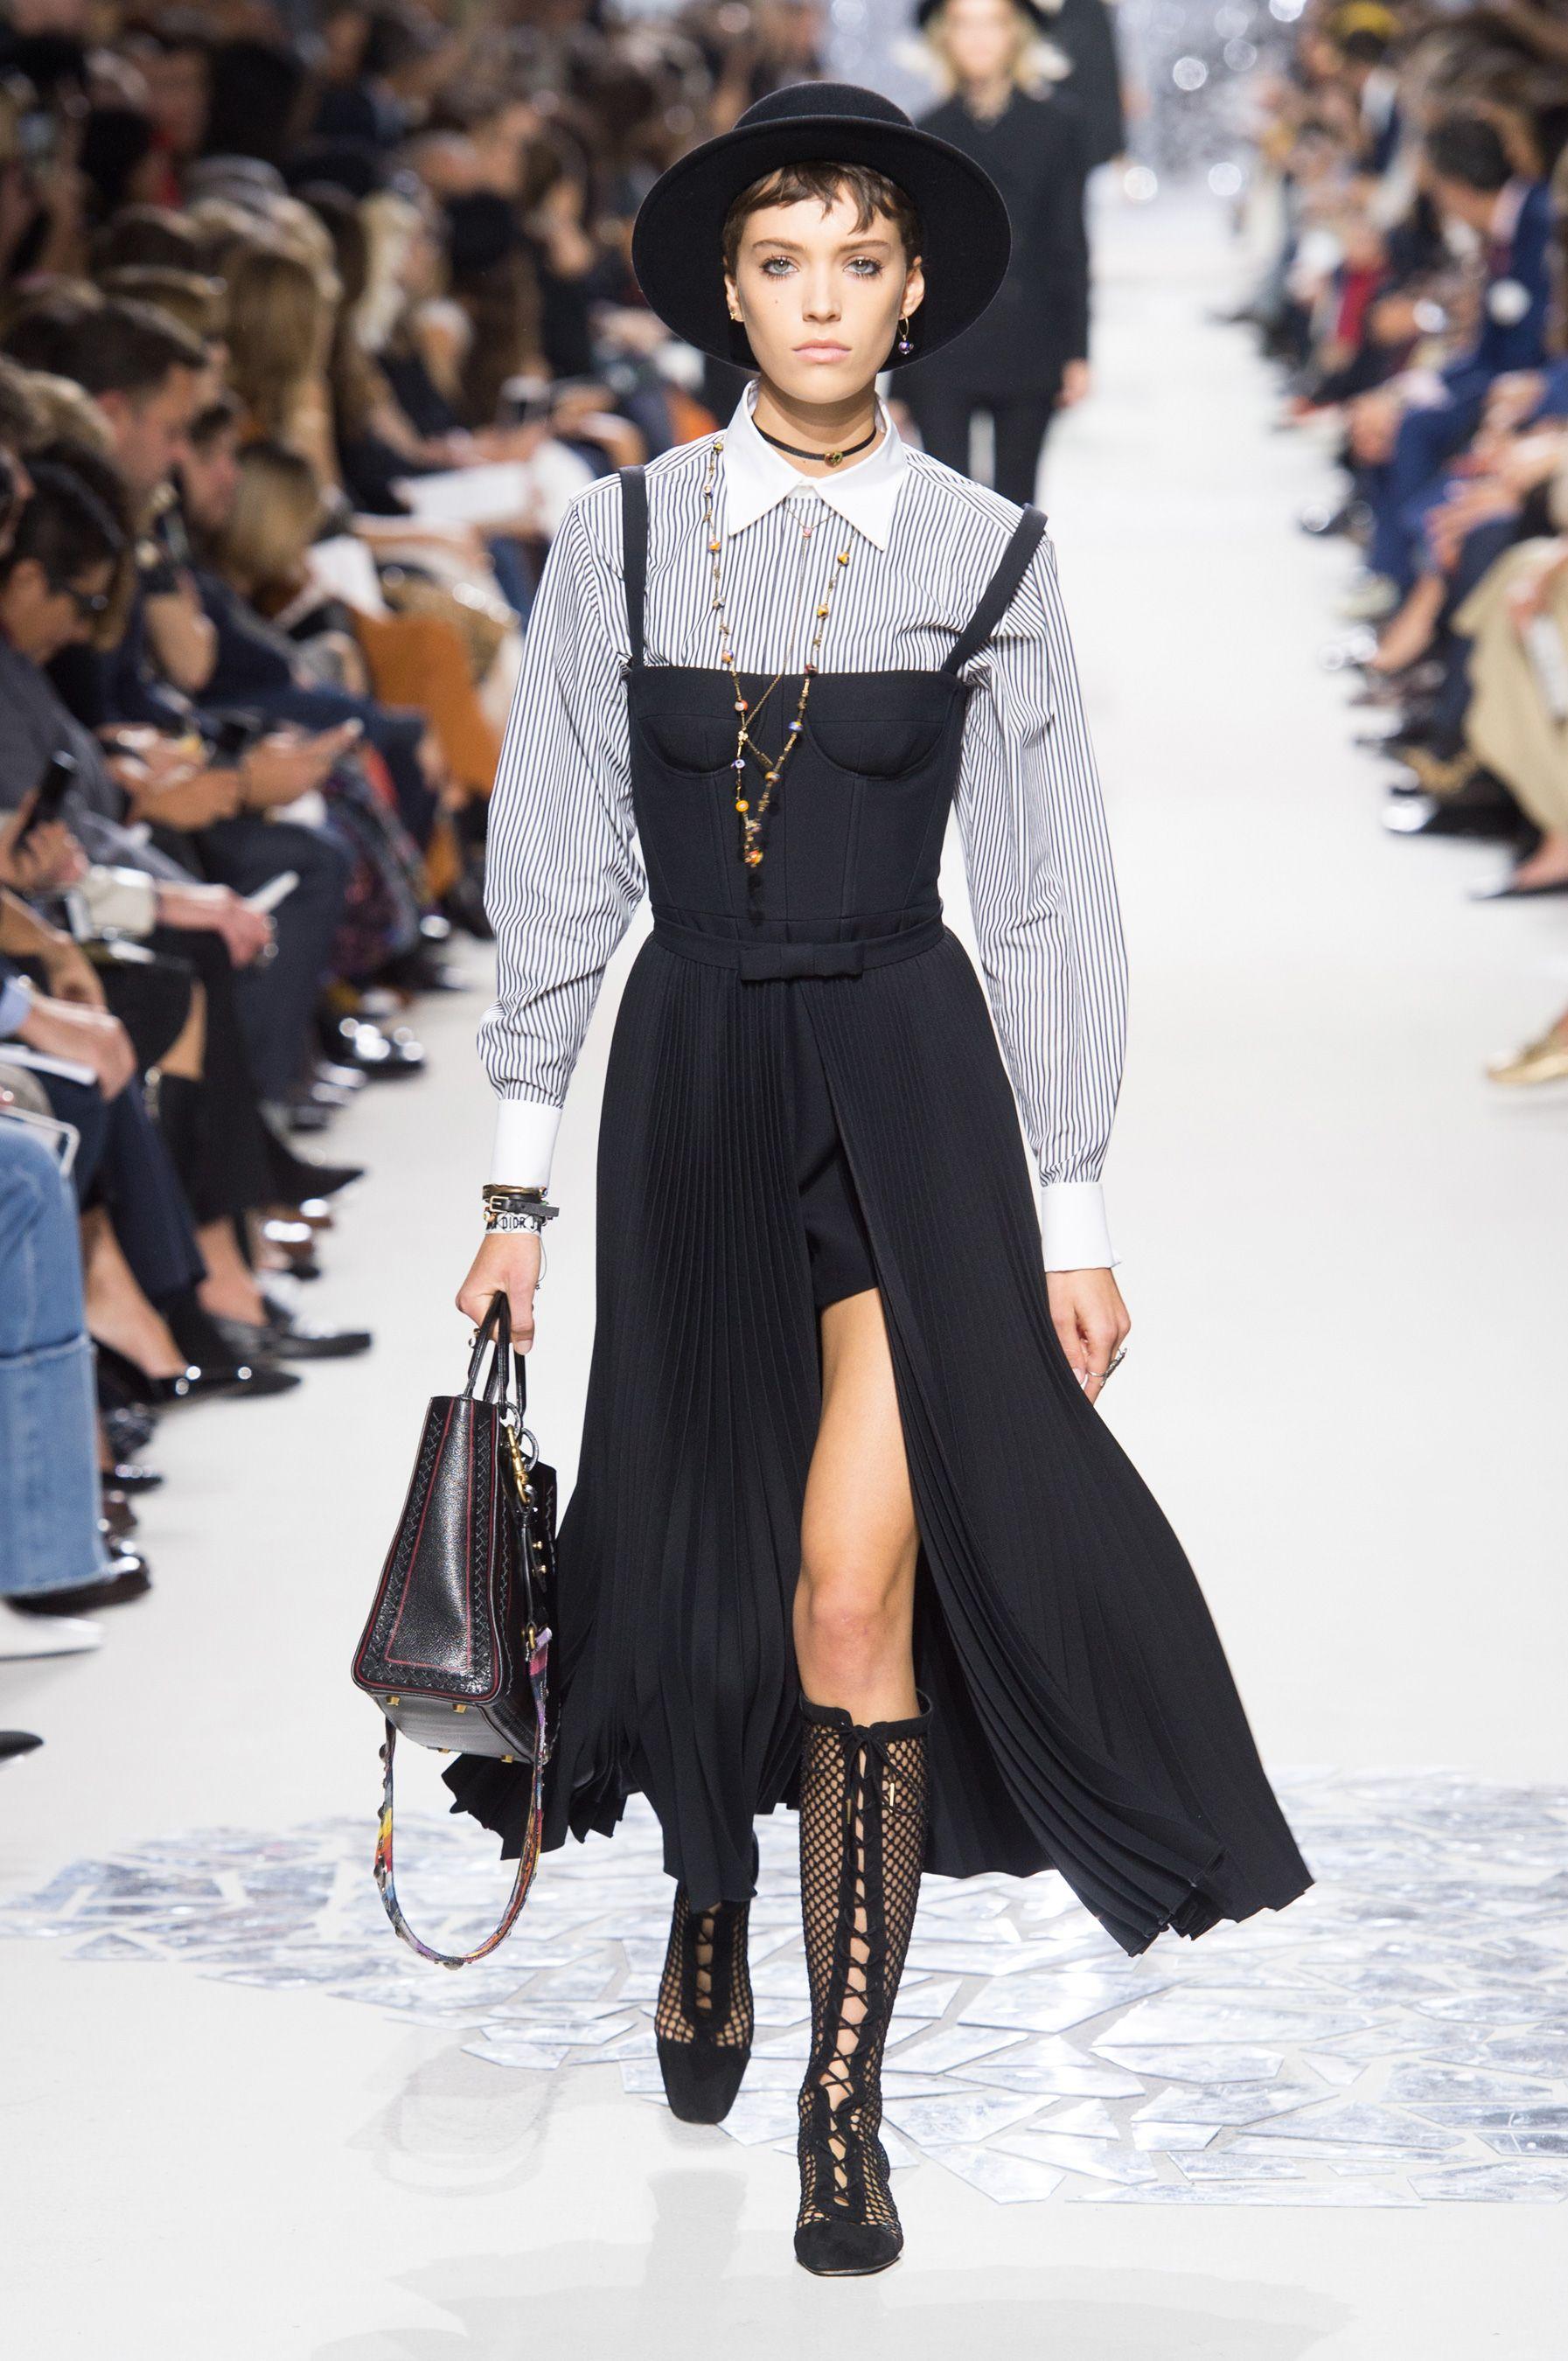 Christian Dior SS18